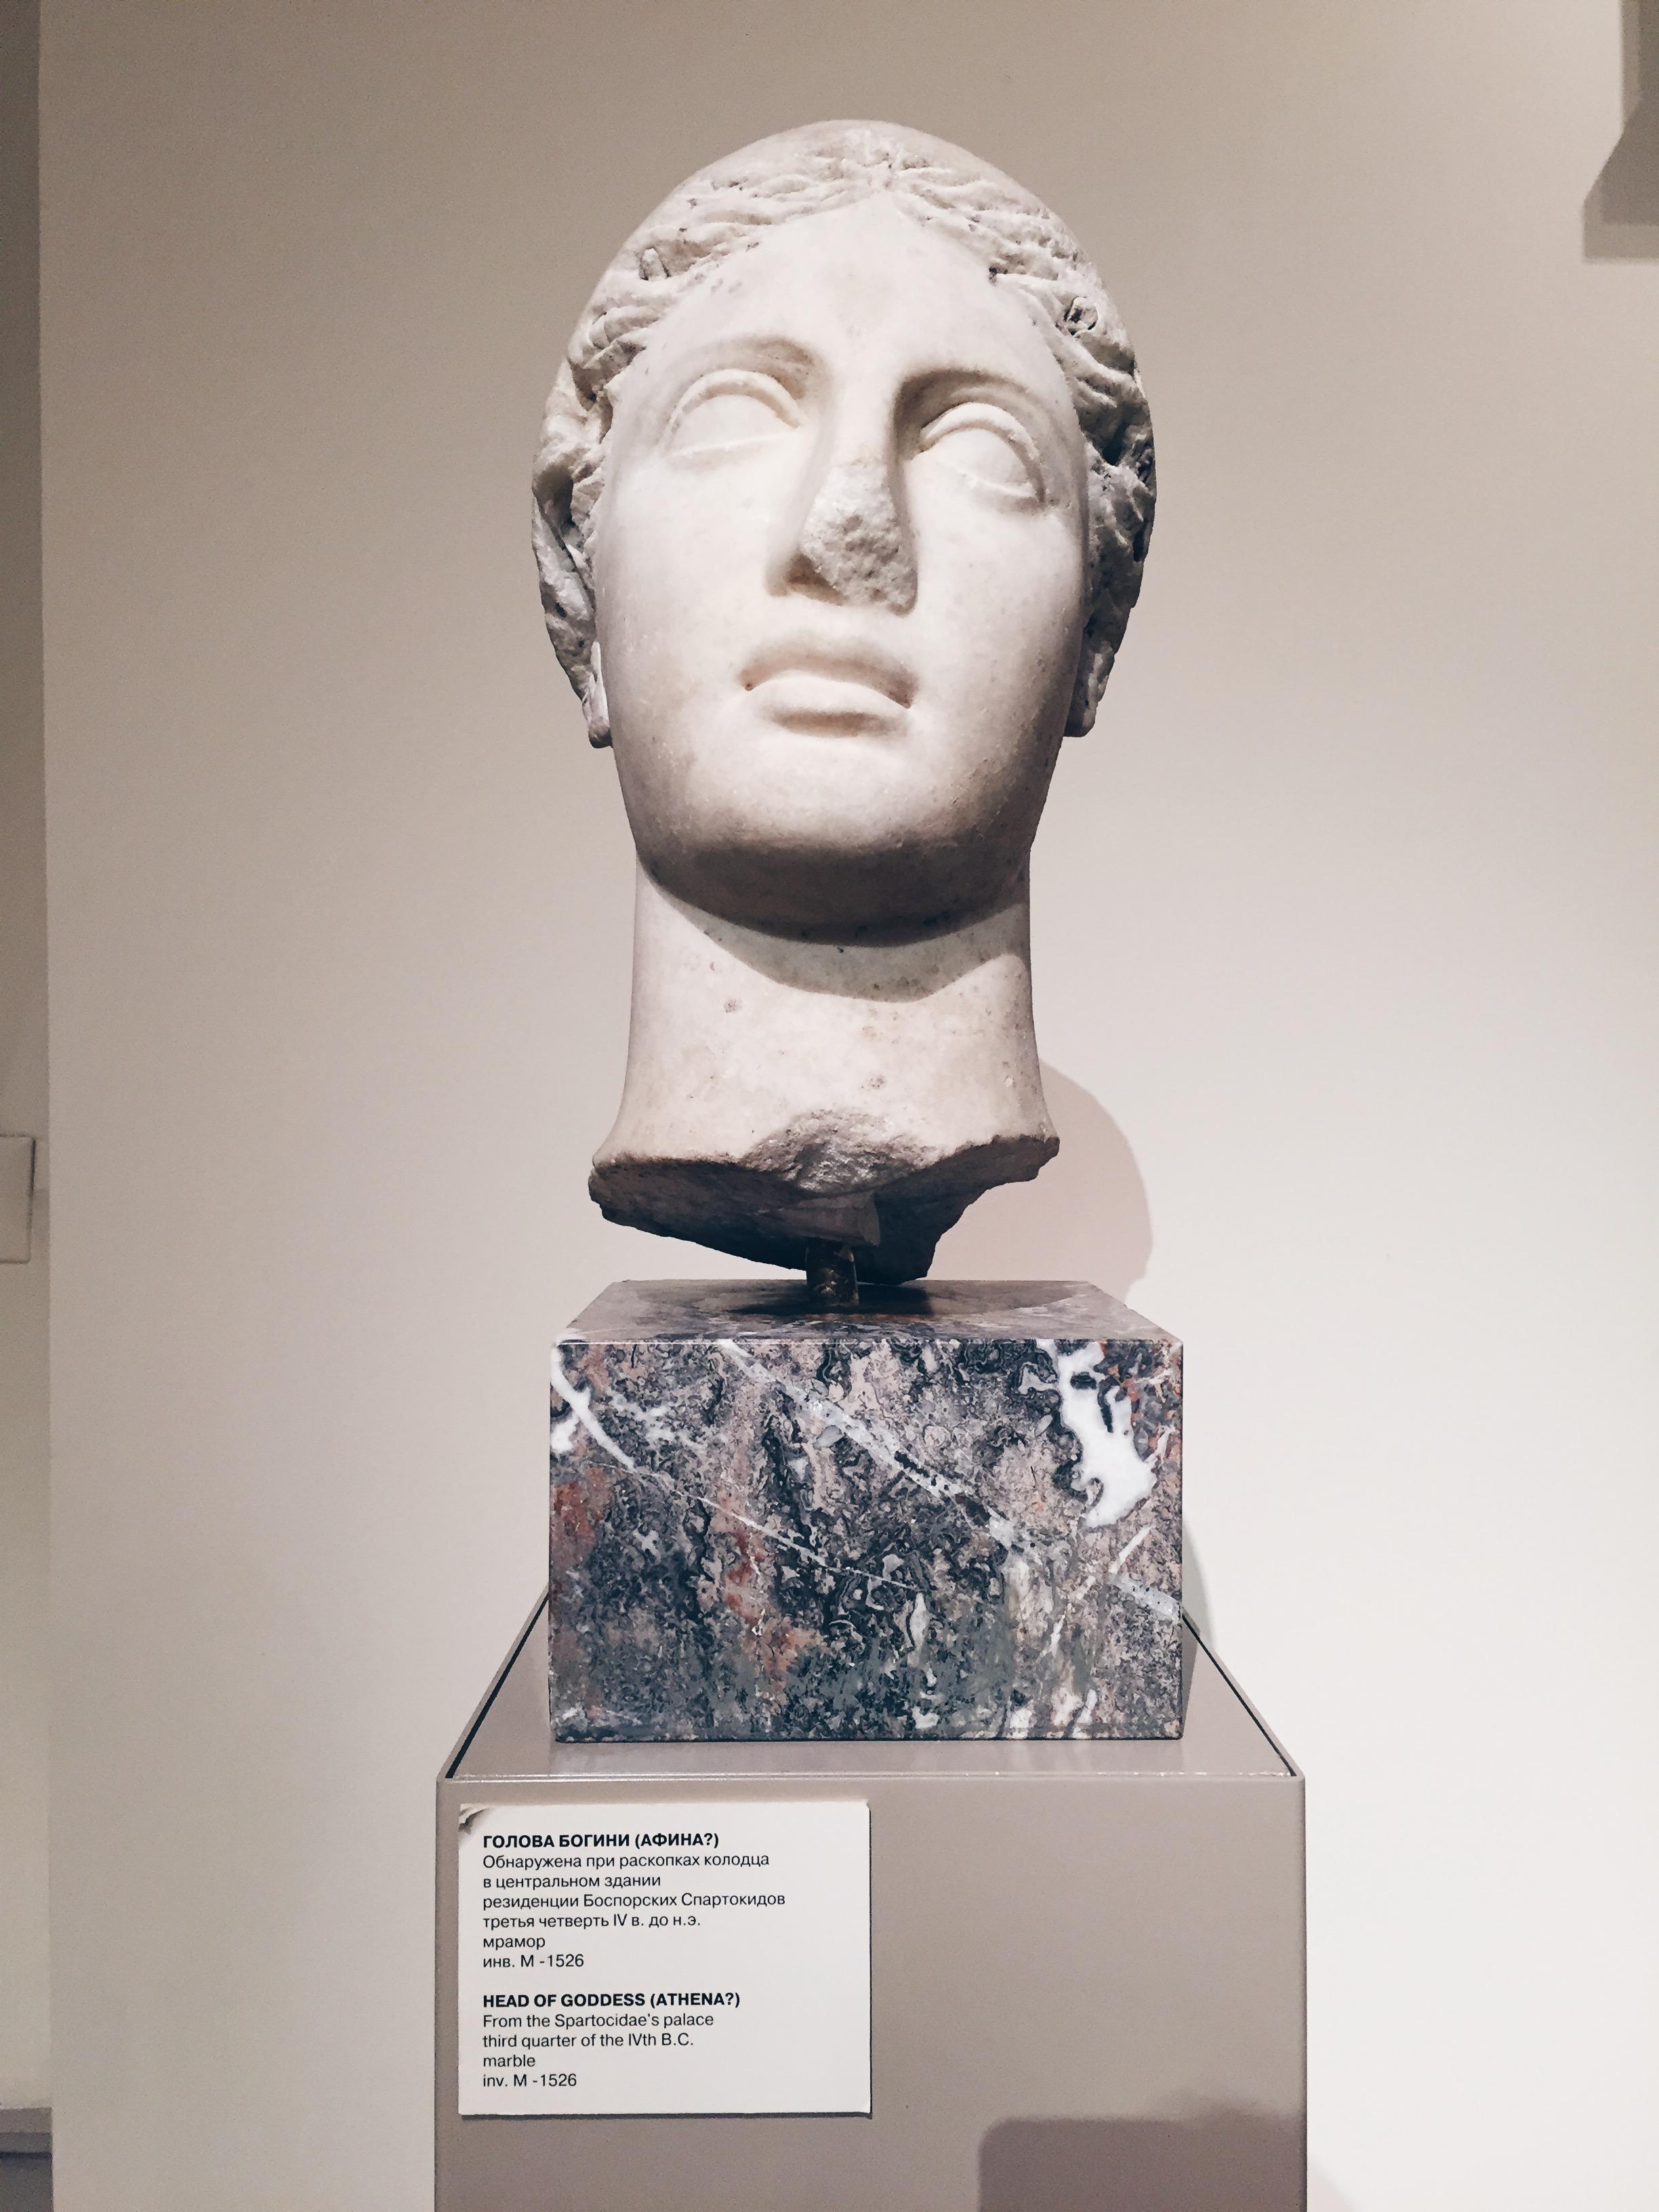 Thought to be Goddess Athena